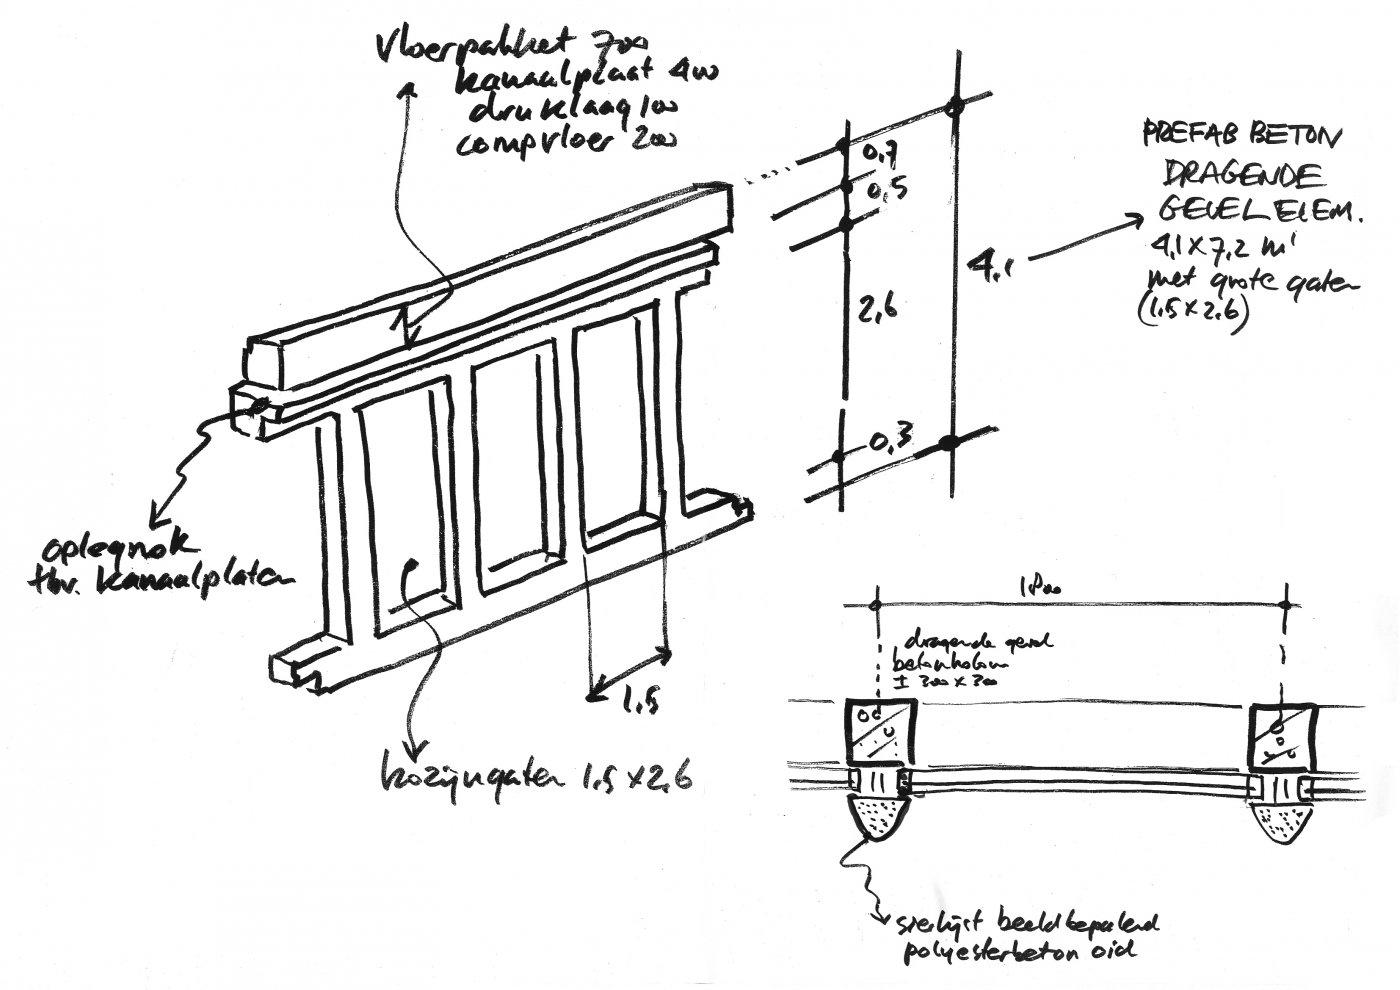 Prefab betongevel element